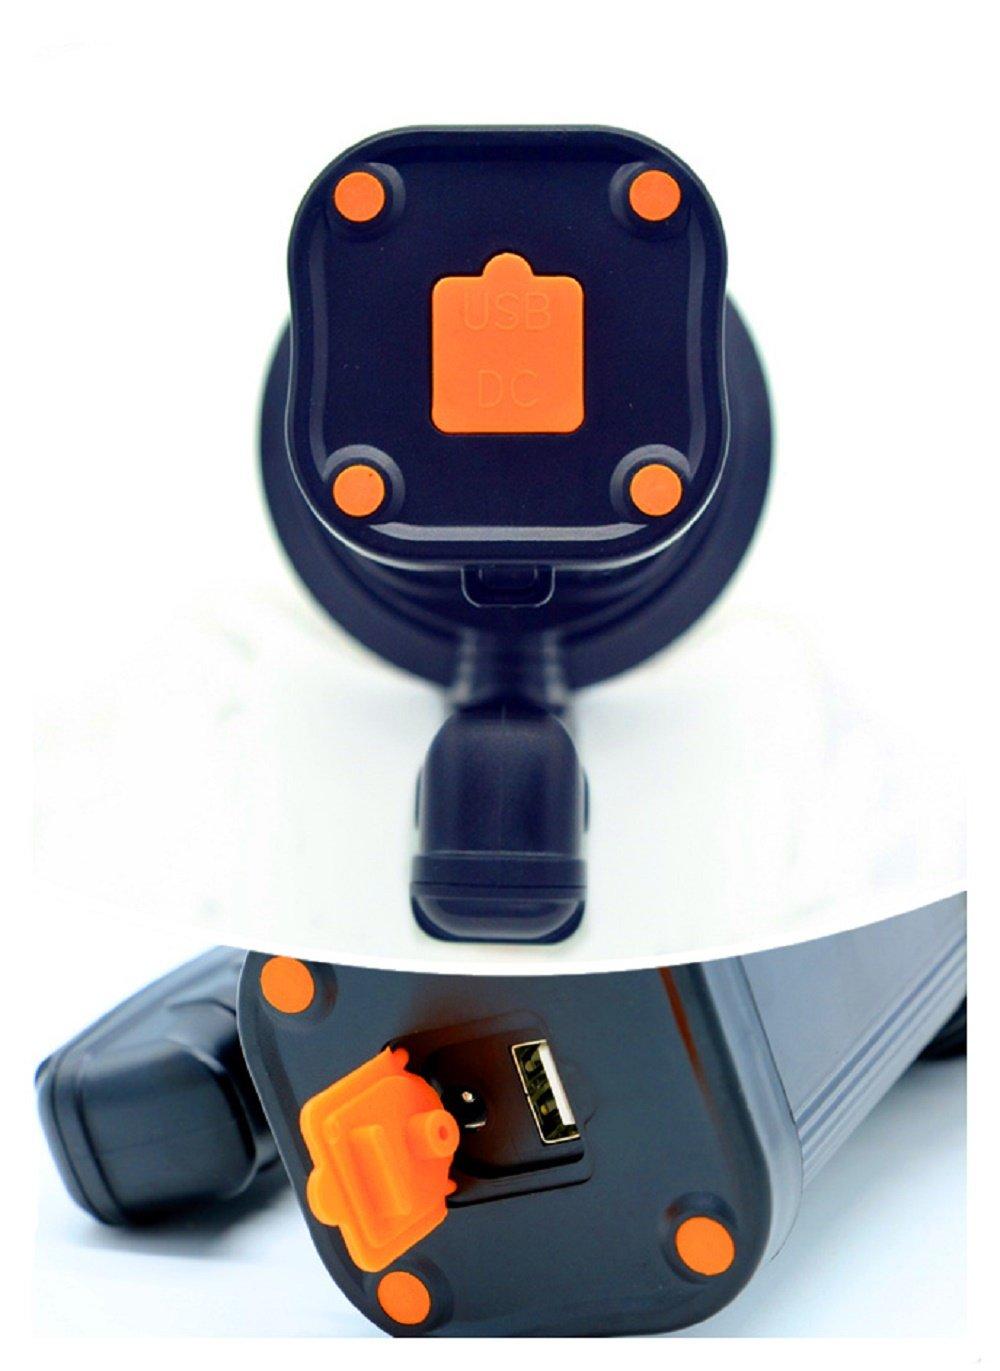 Ambertech Rechargeable 7000 Lumens Super Bright LED Searchlight Spotlight Flashlight Torch Lantern With Sharp Light 3